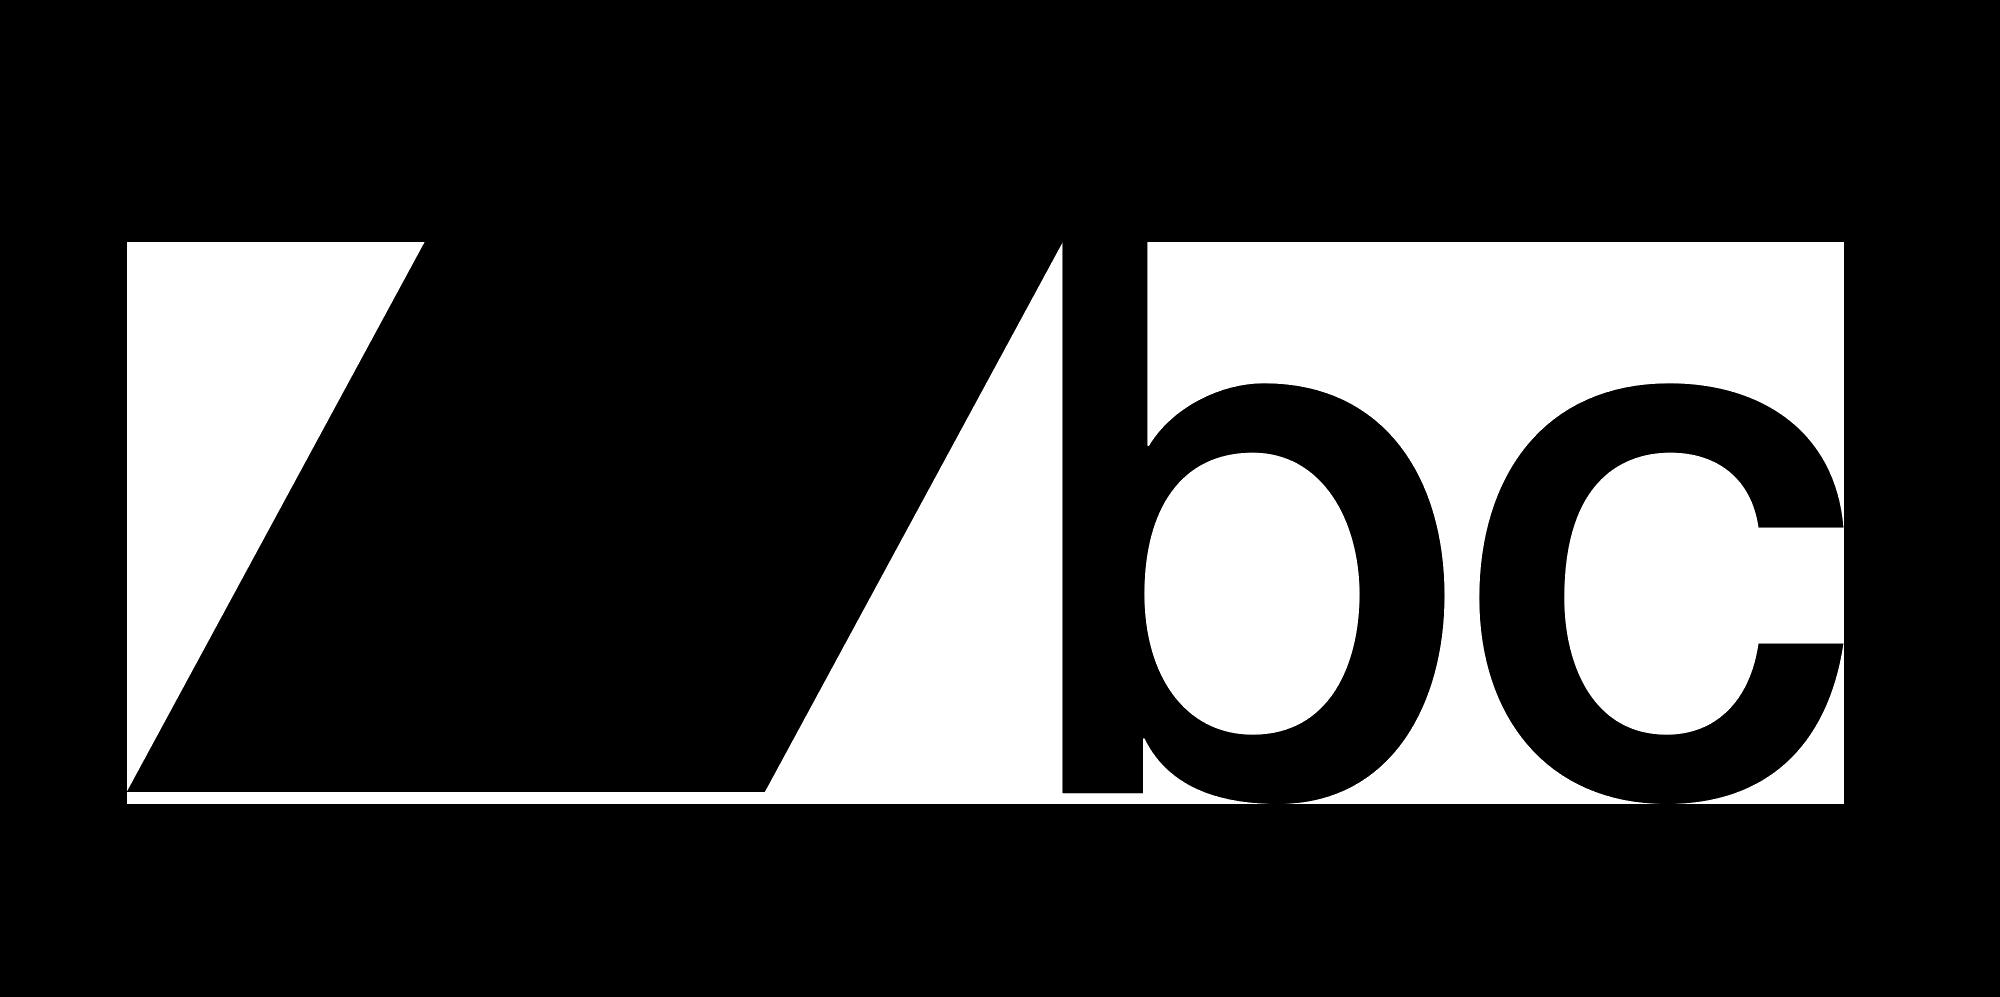 bcccc.png